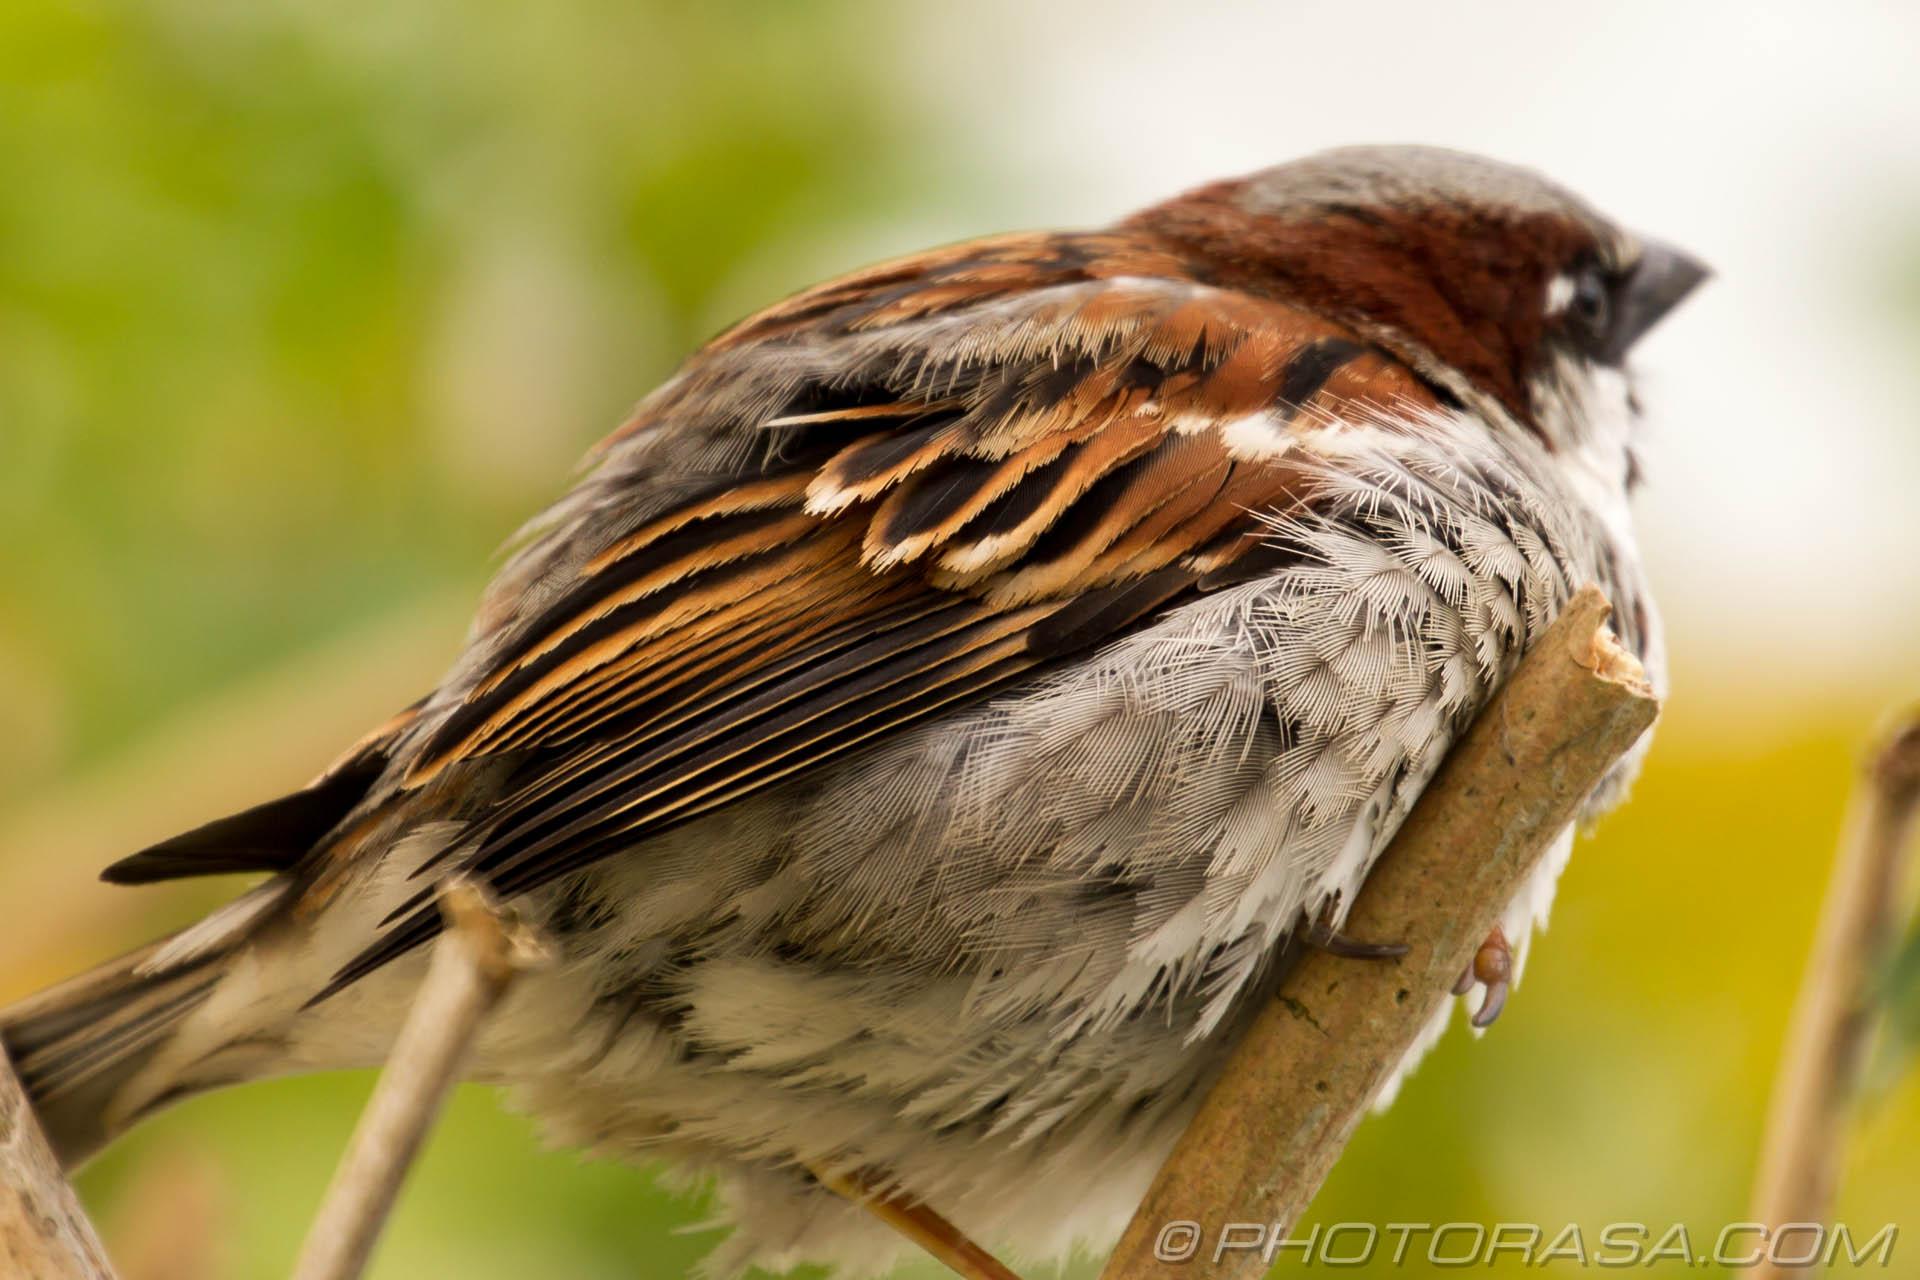 http://photorasa.com/sparrows/sparrow-feathers/